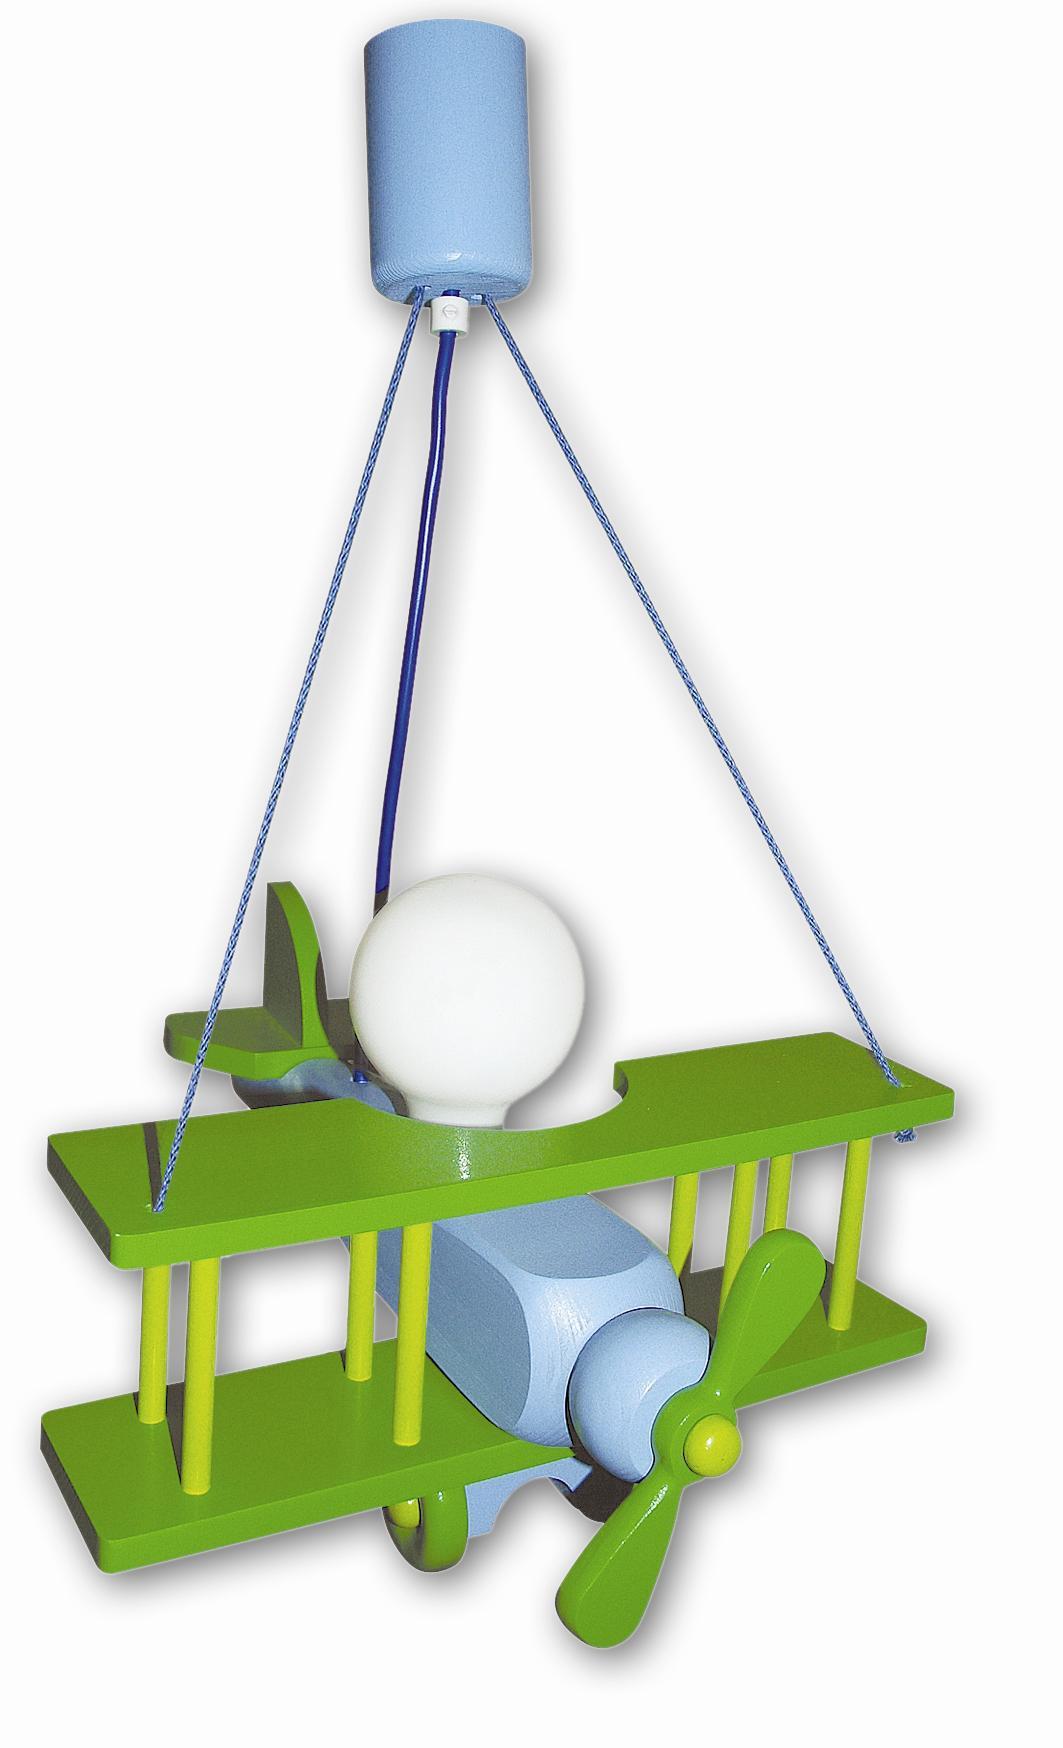 waldi h ngeleuchte flugzeug gr n blau klein pendelleuchten aus holz oder. Black Bedroom Furniture Sets. Home Design Ideas